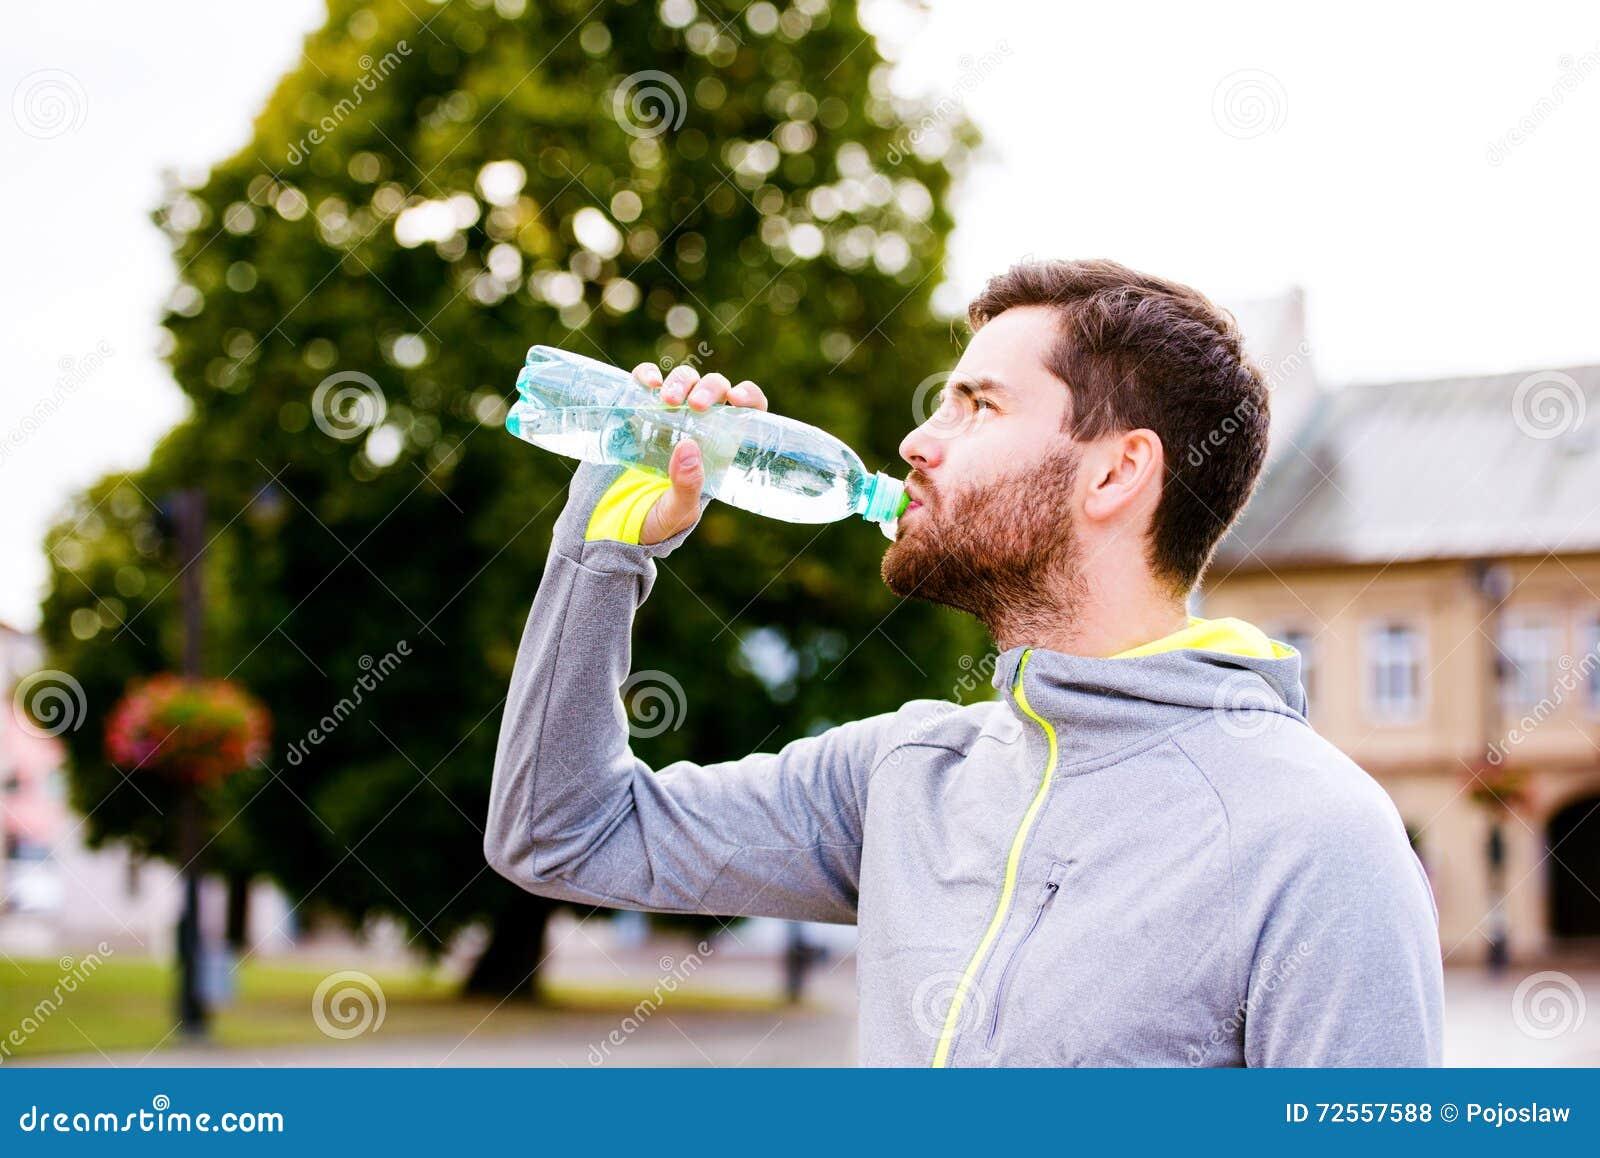 Молодой бегун битника в городке при бутылка с водой ...